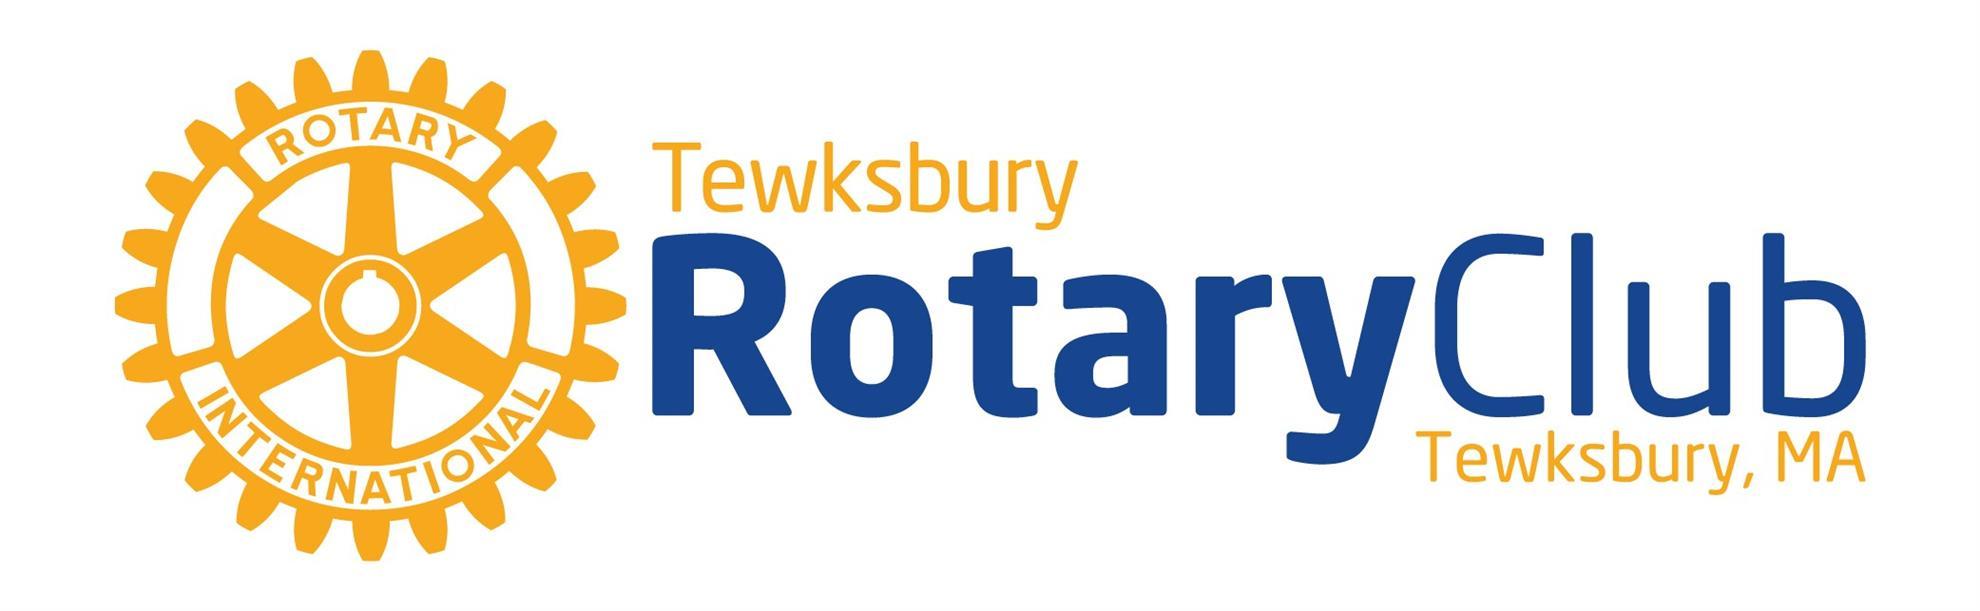 Tewksbury logo